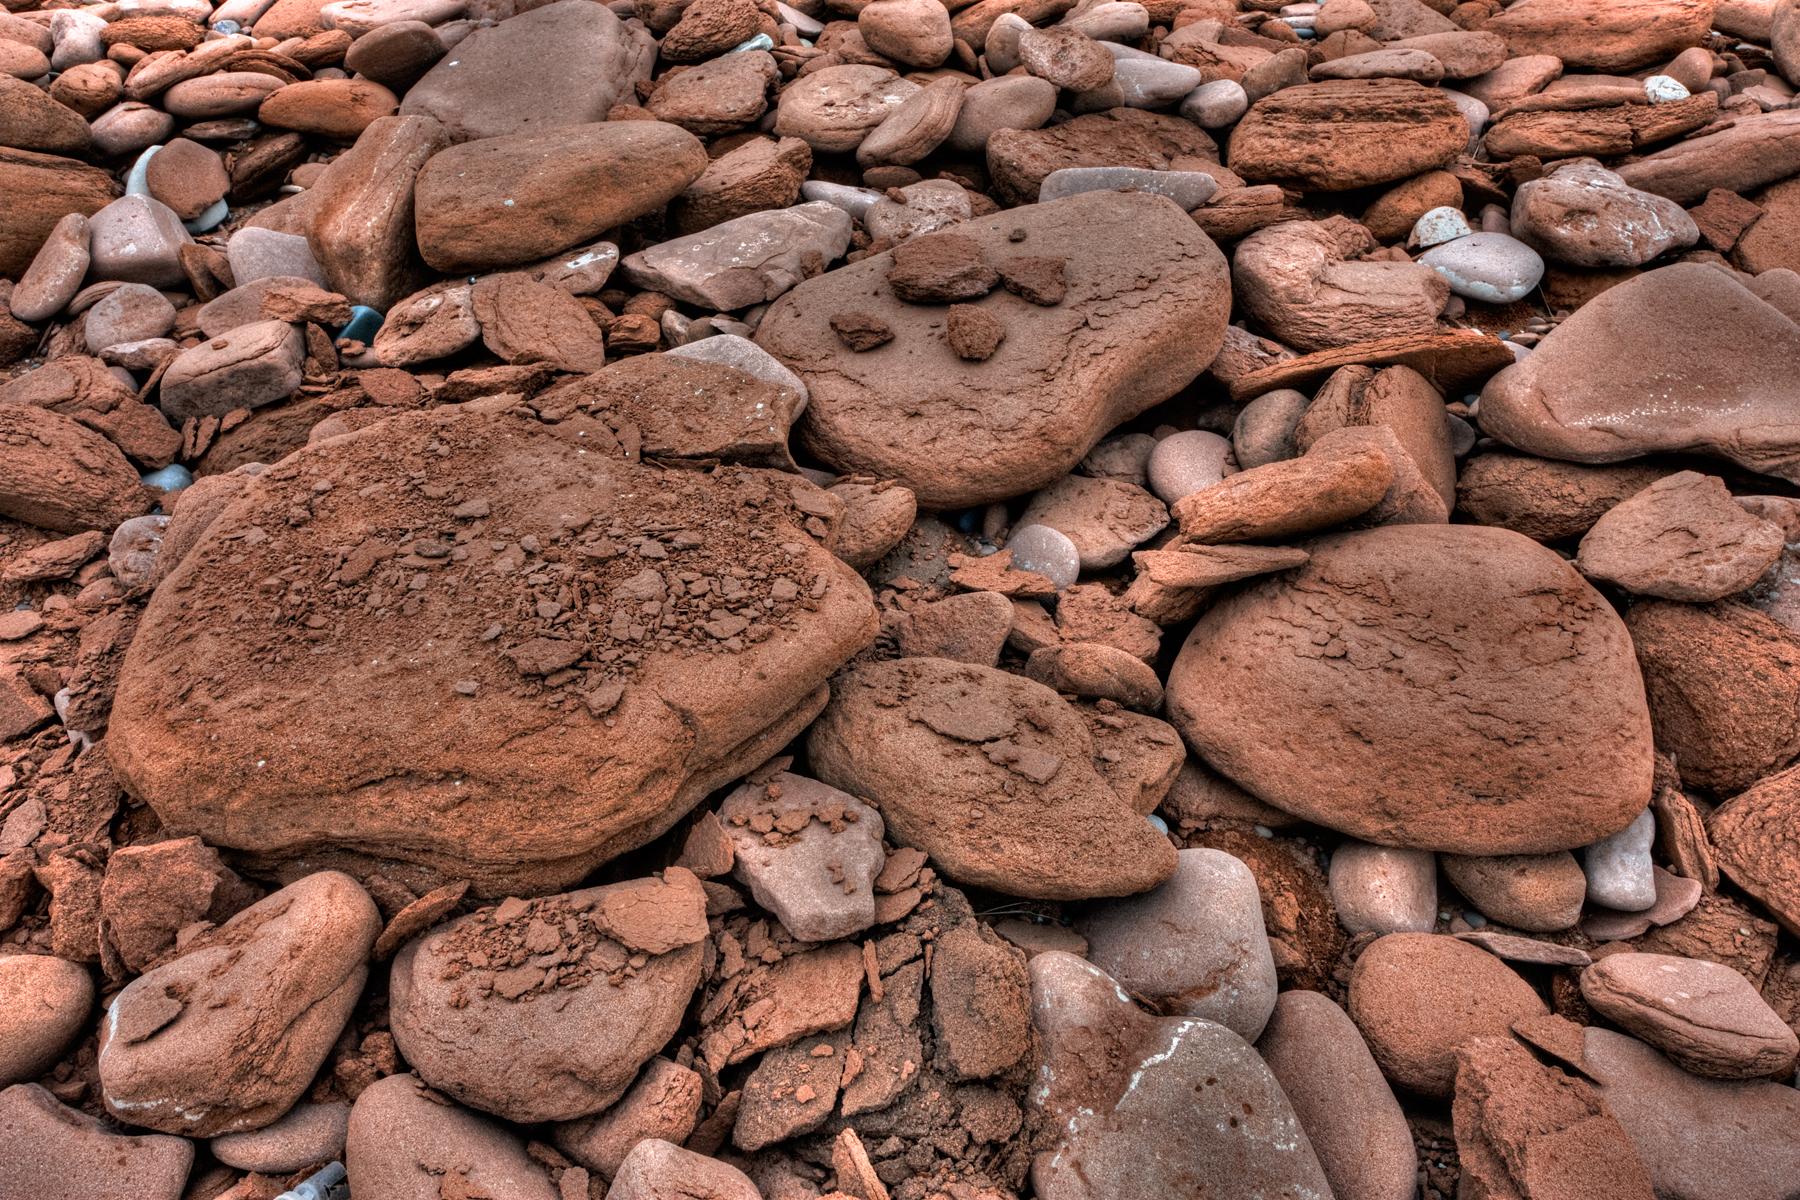 Rocky Texture - HDR, Backdrop, Rough, Pebbles, Photo, HQ Photo